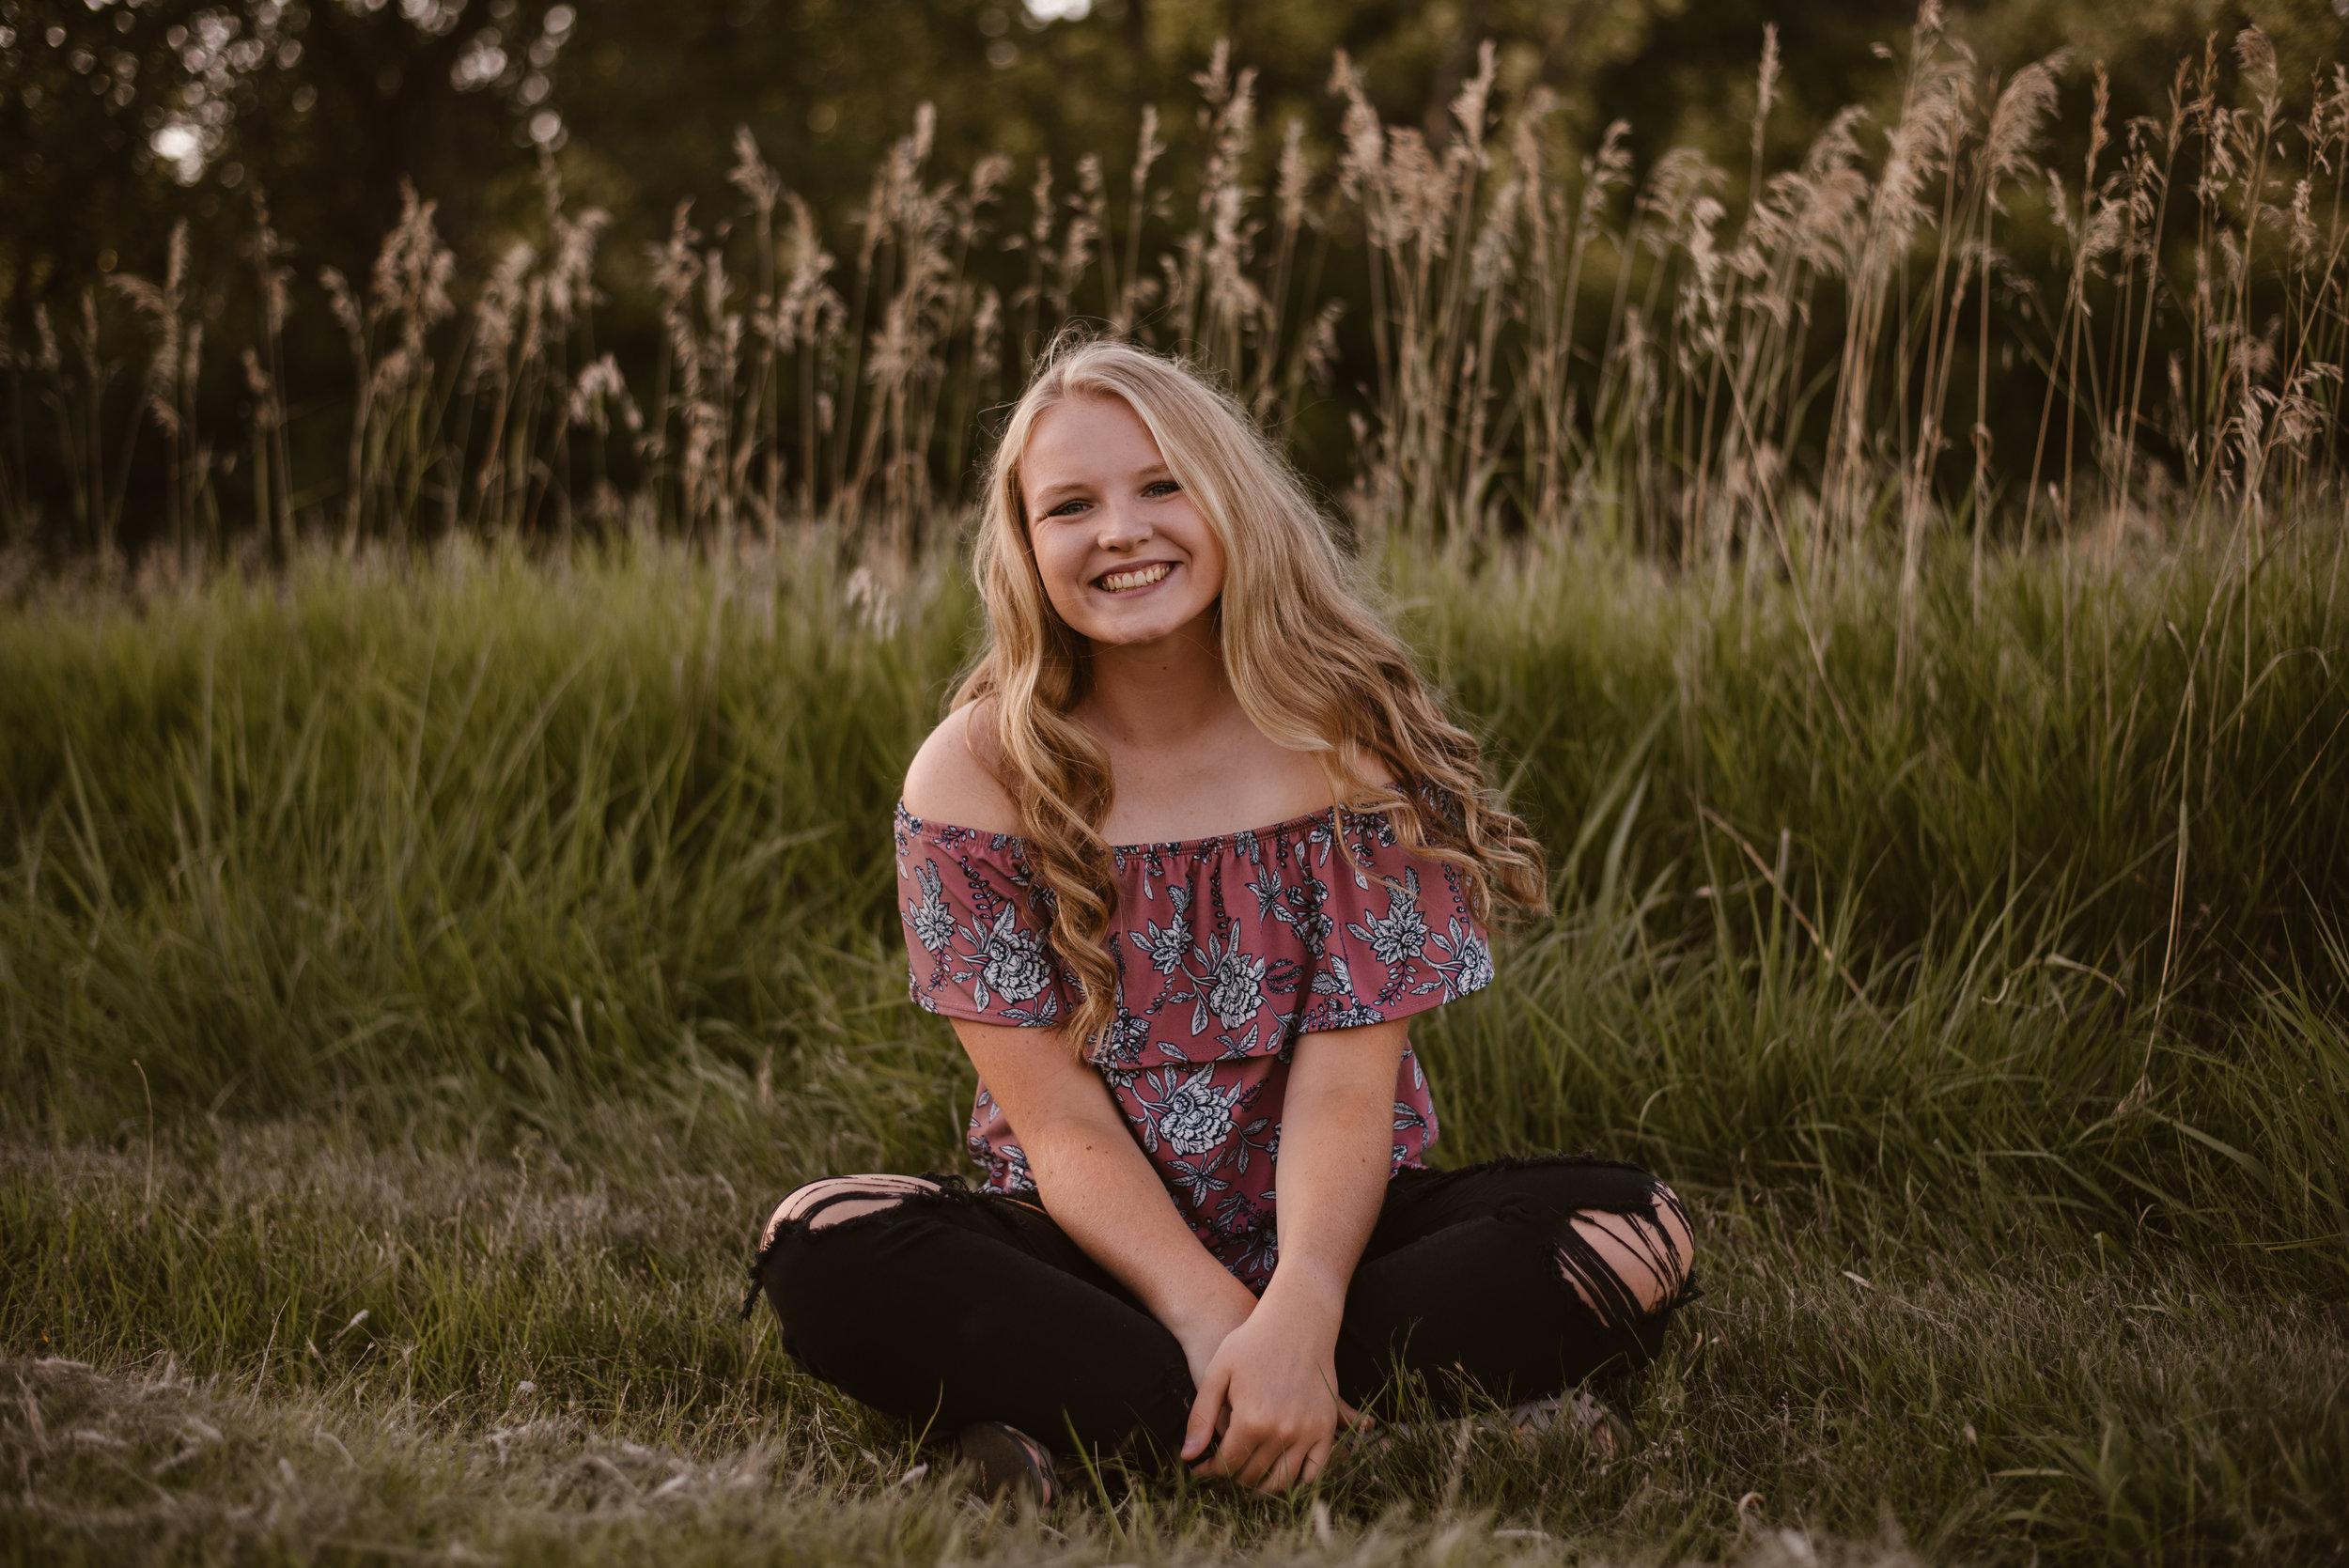 Kaylie-Sirek-Photography-Grand-Island-Nebraska-Senior-009.jpg